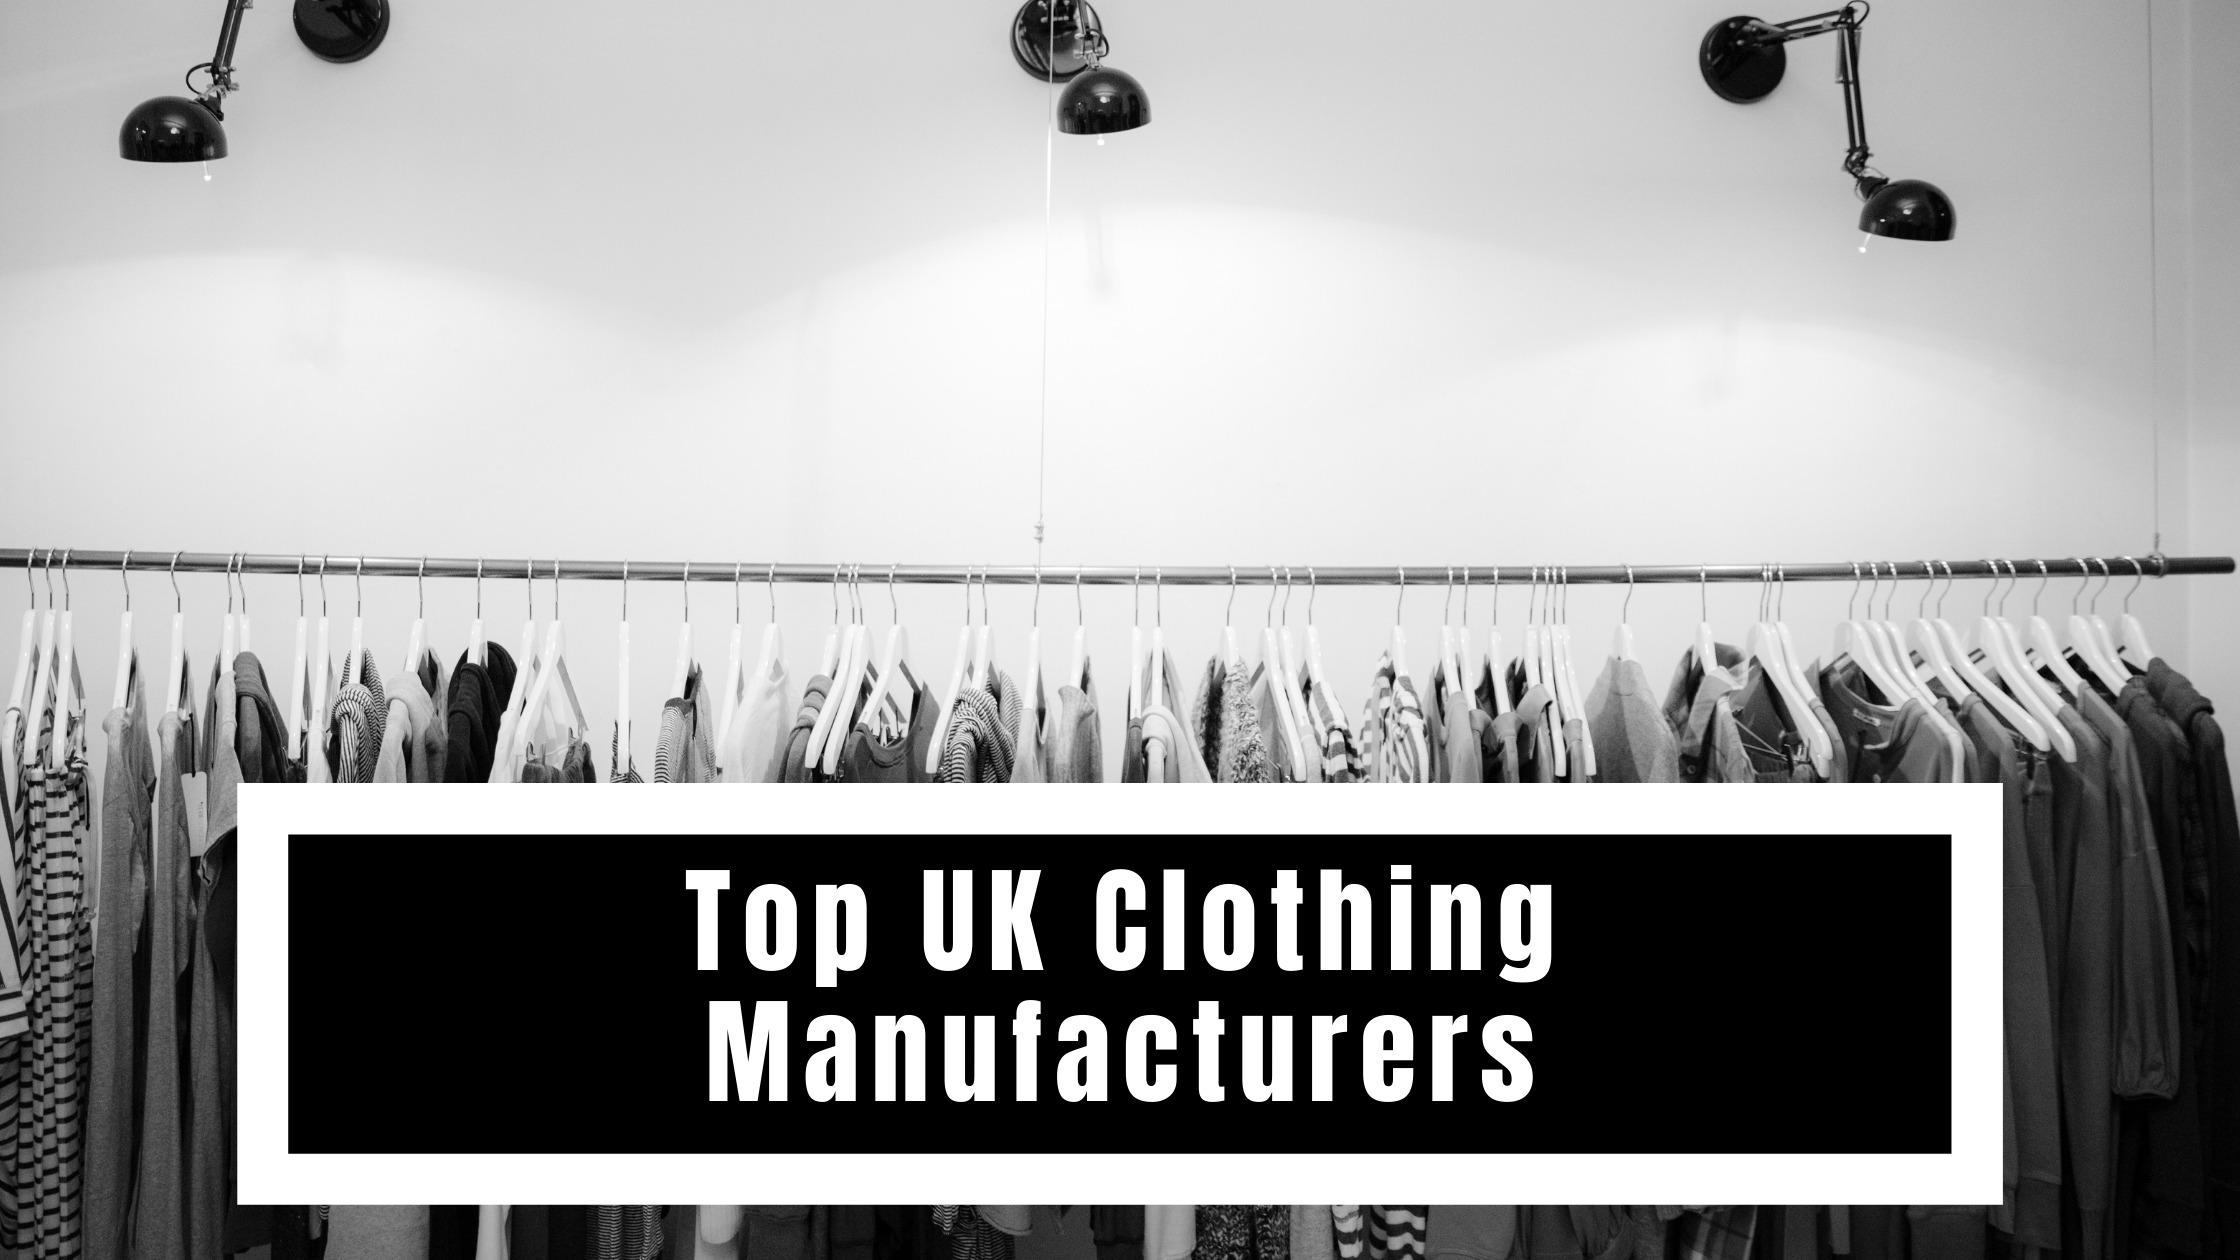 Top UK Clothing Manufacturers